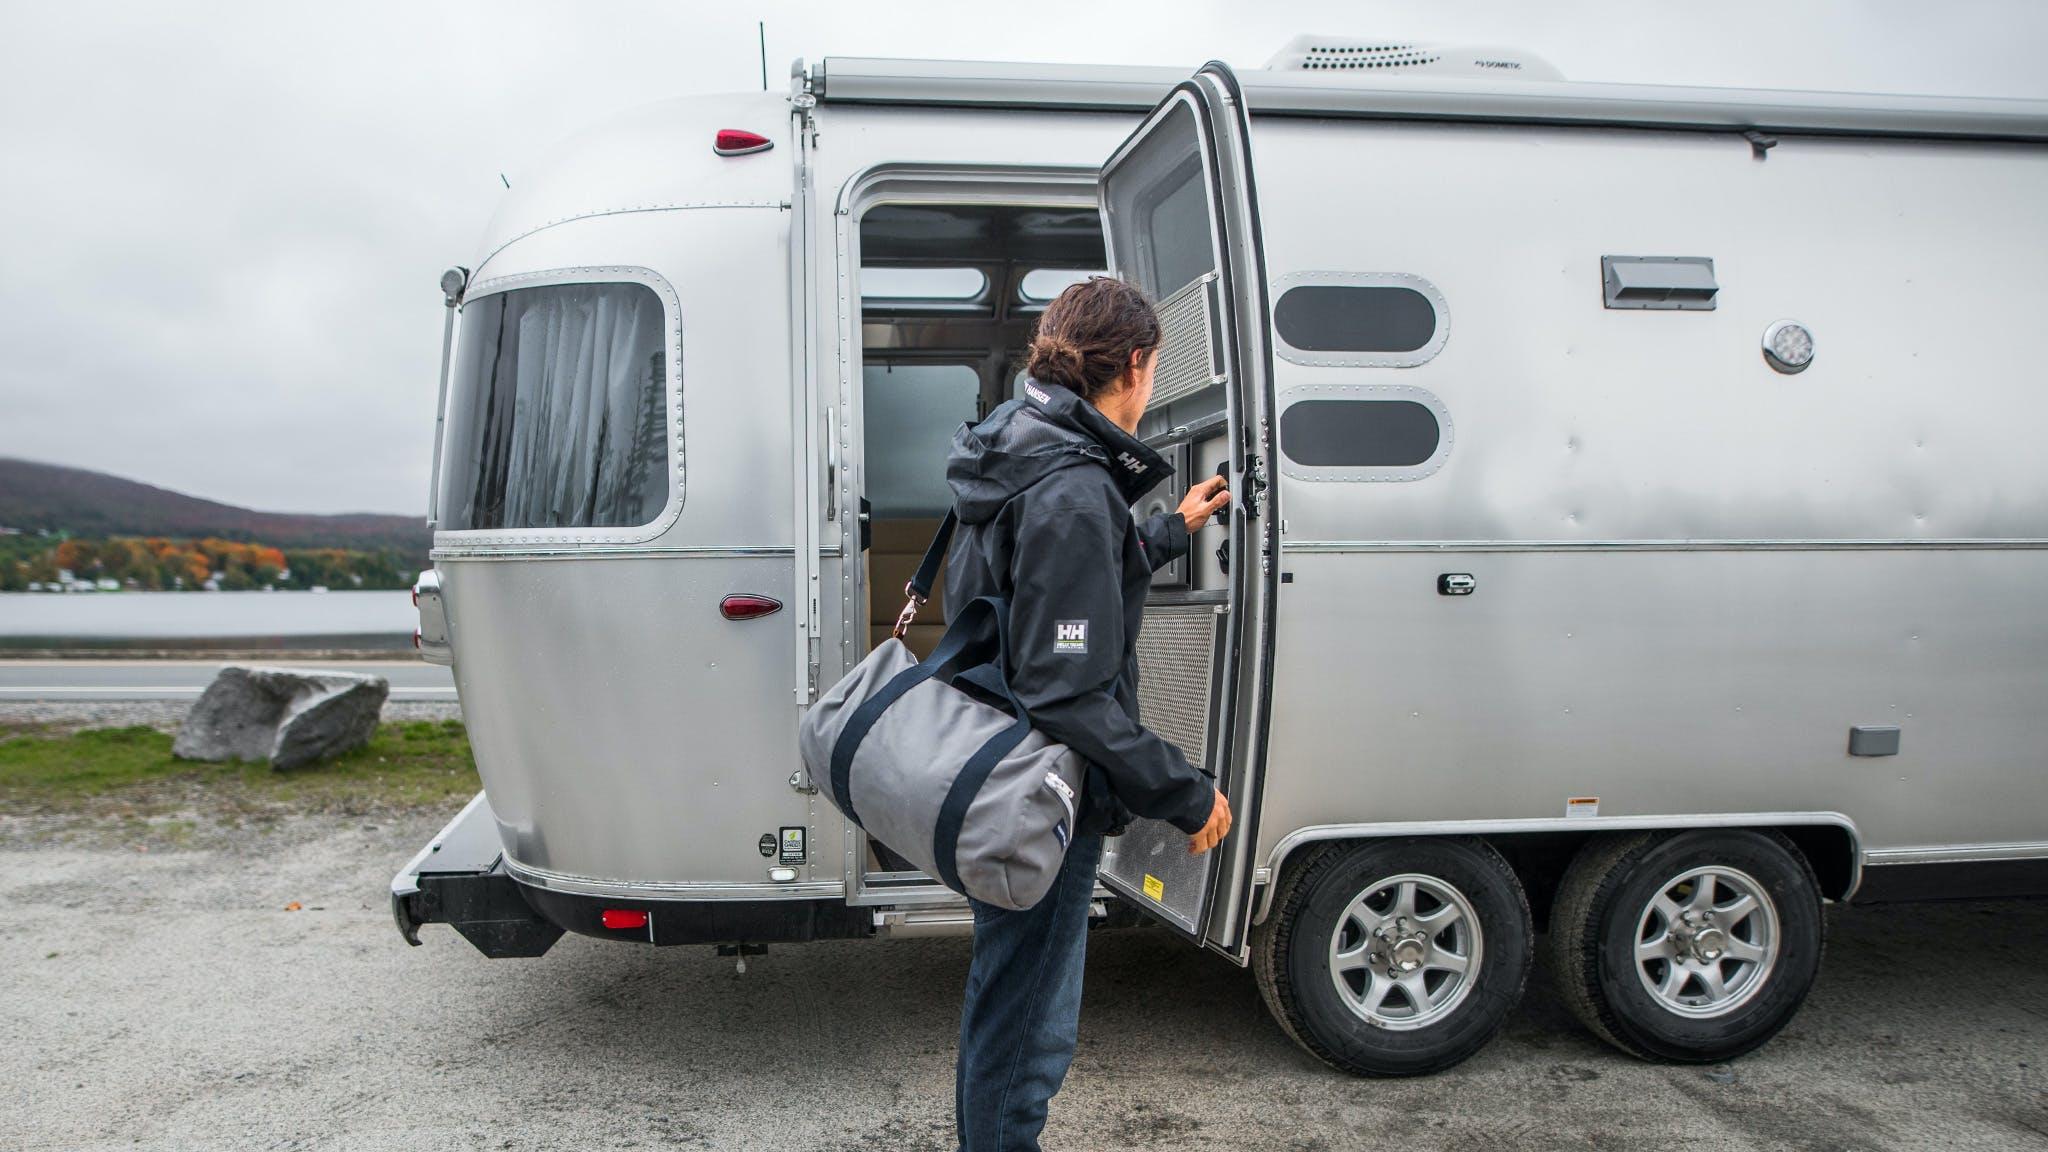 Airstream-Travel-Trailer-Packing-Preparation-blog-header